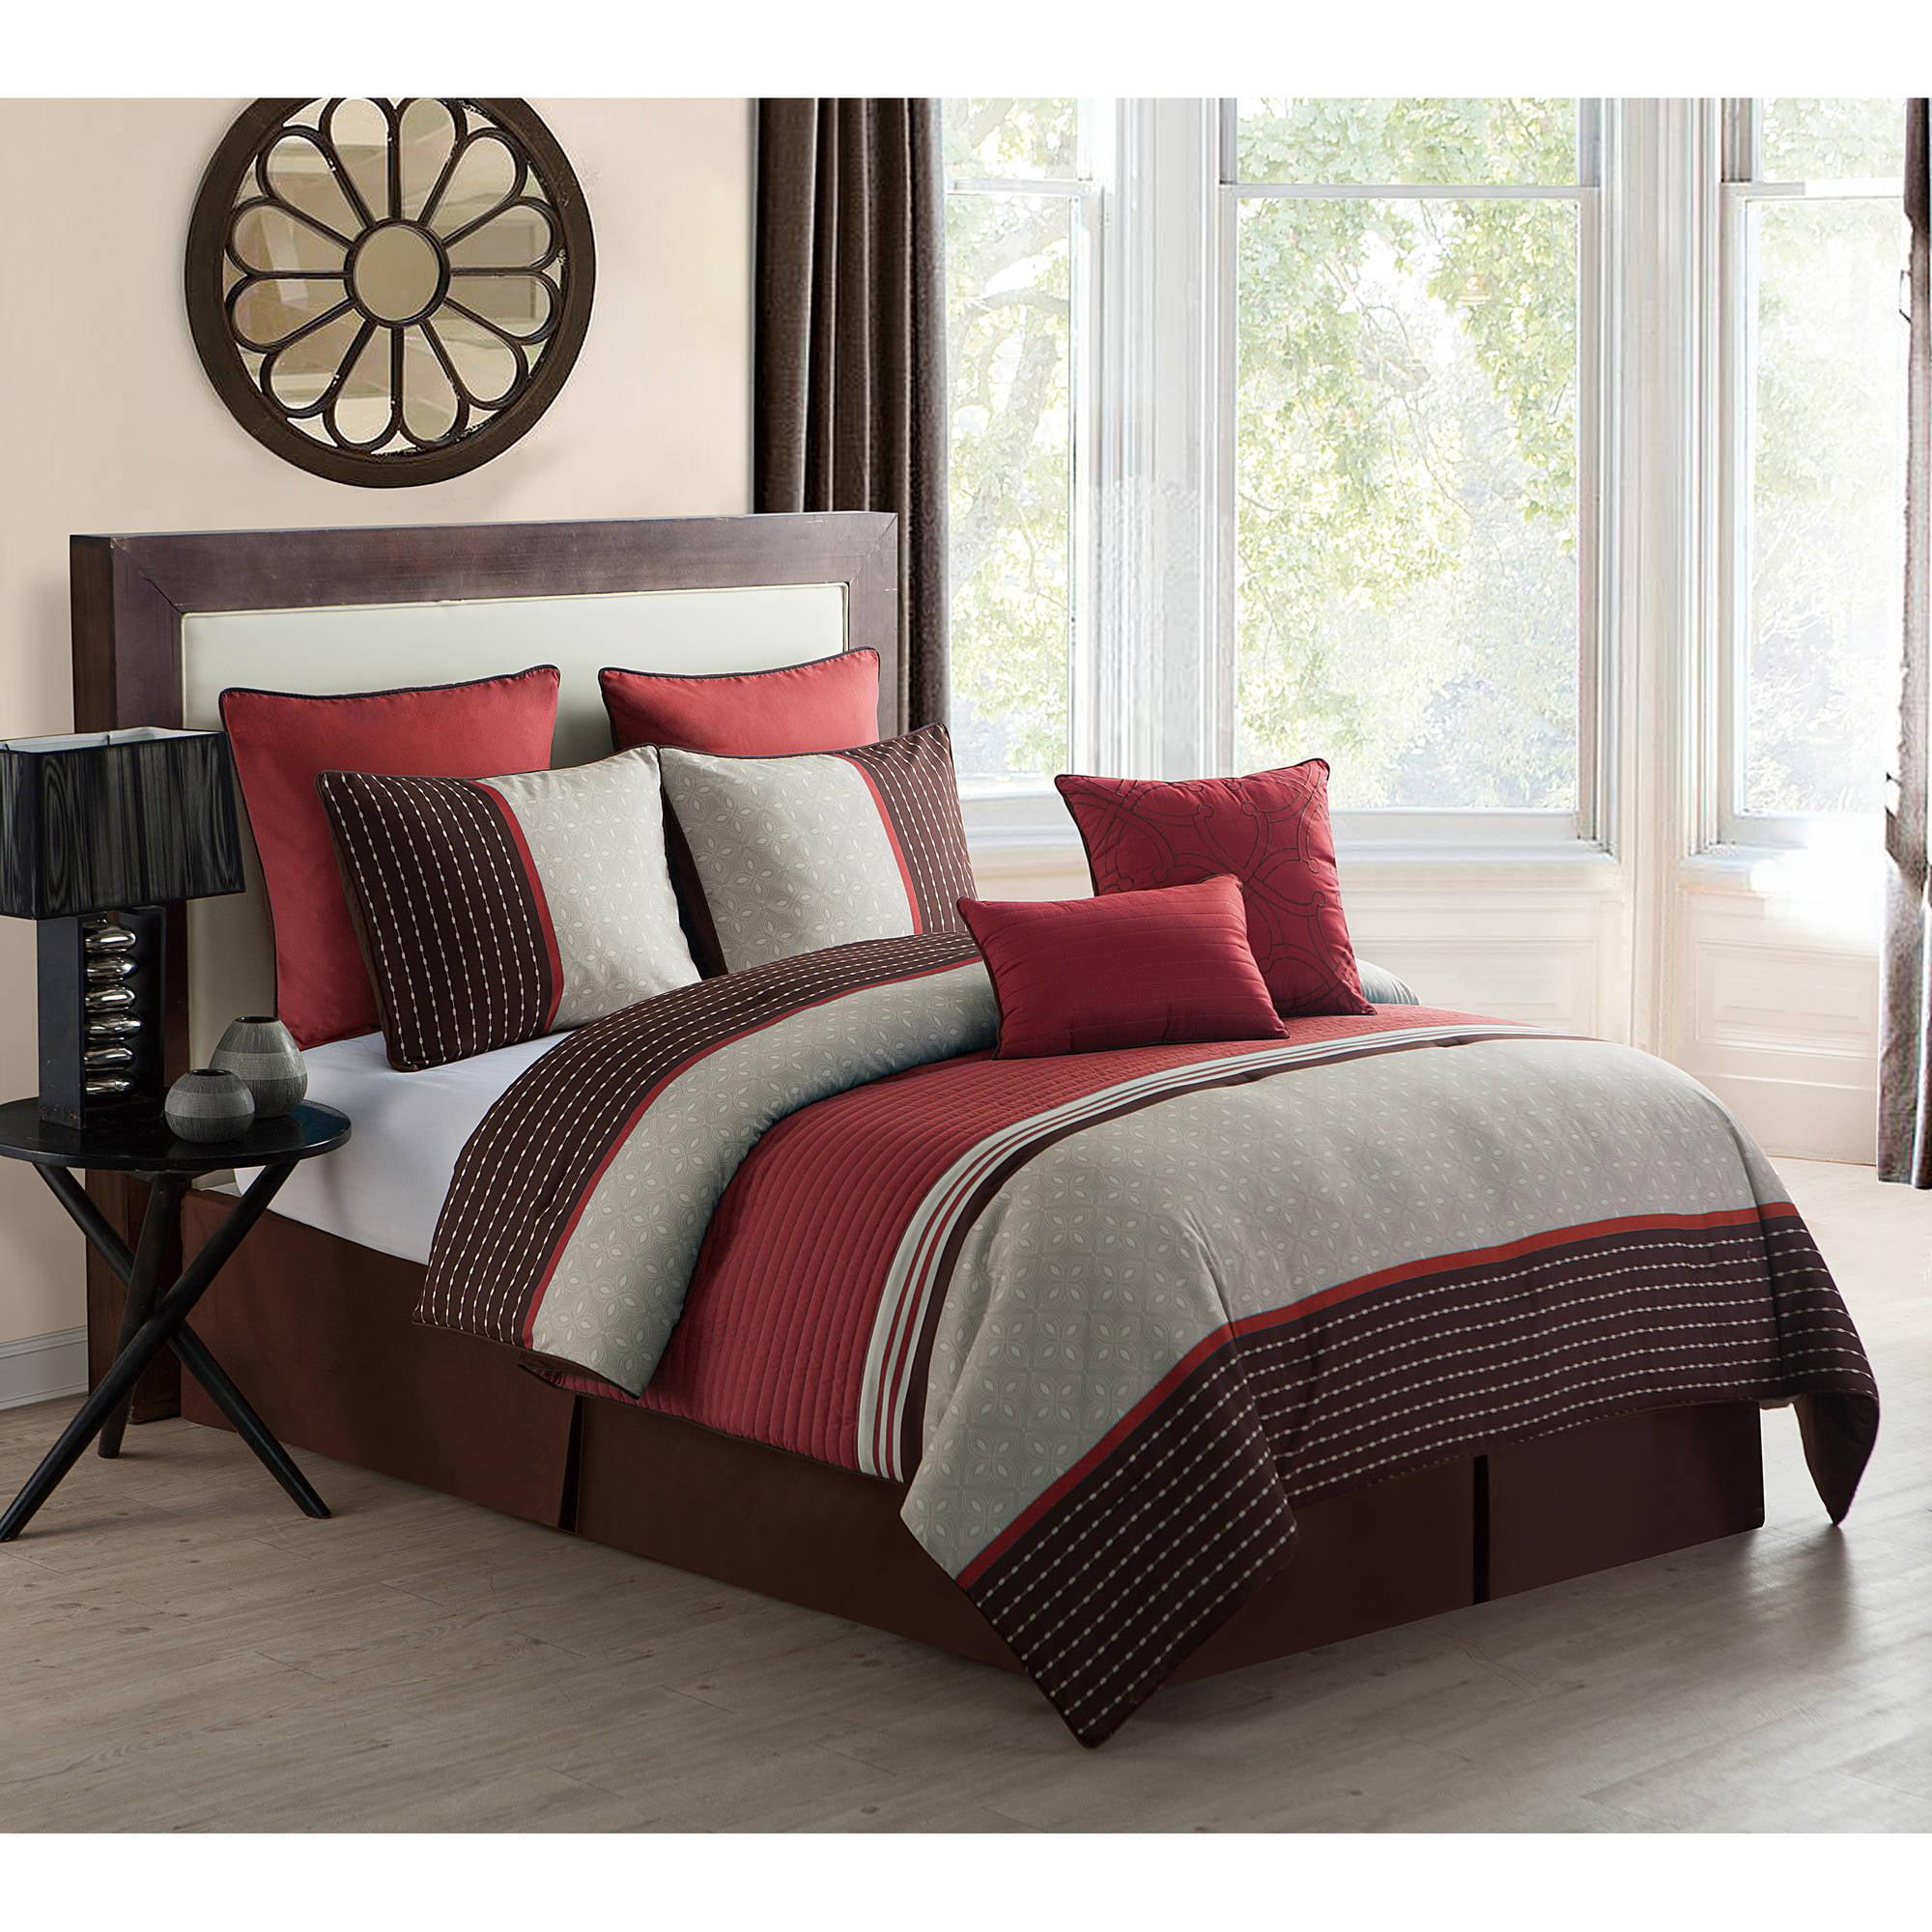 Seville 8-Piece Bedding Comforter Set, Euro Shams included